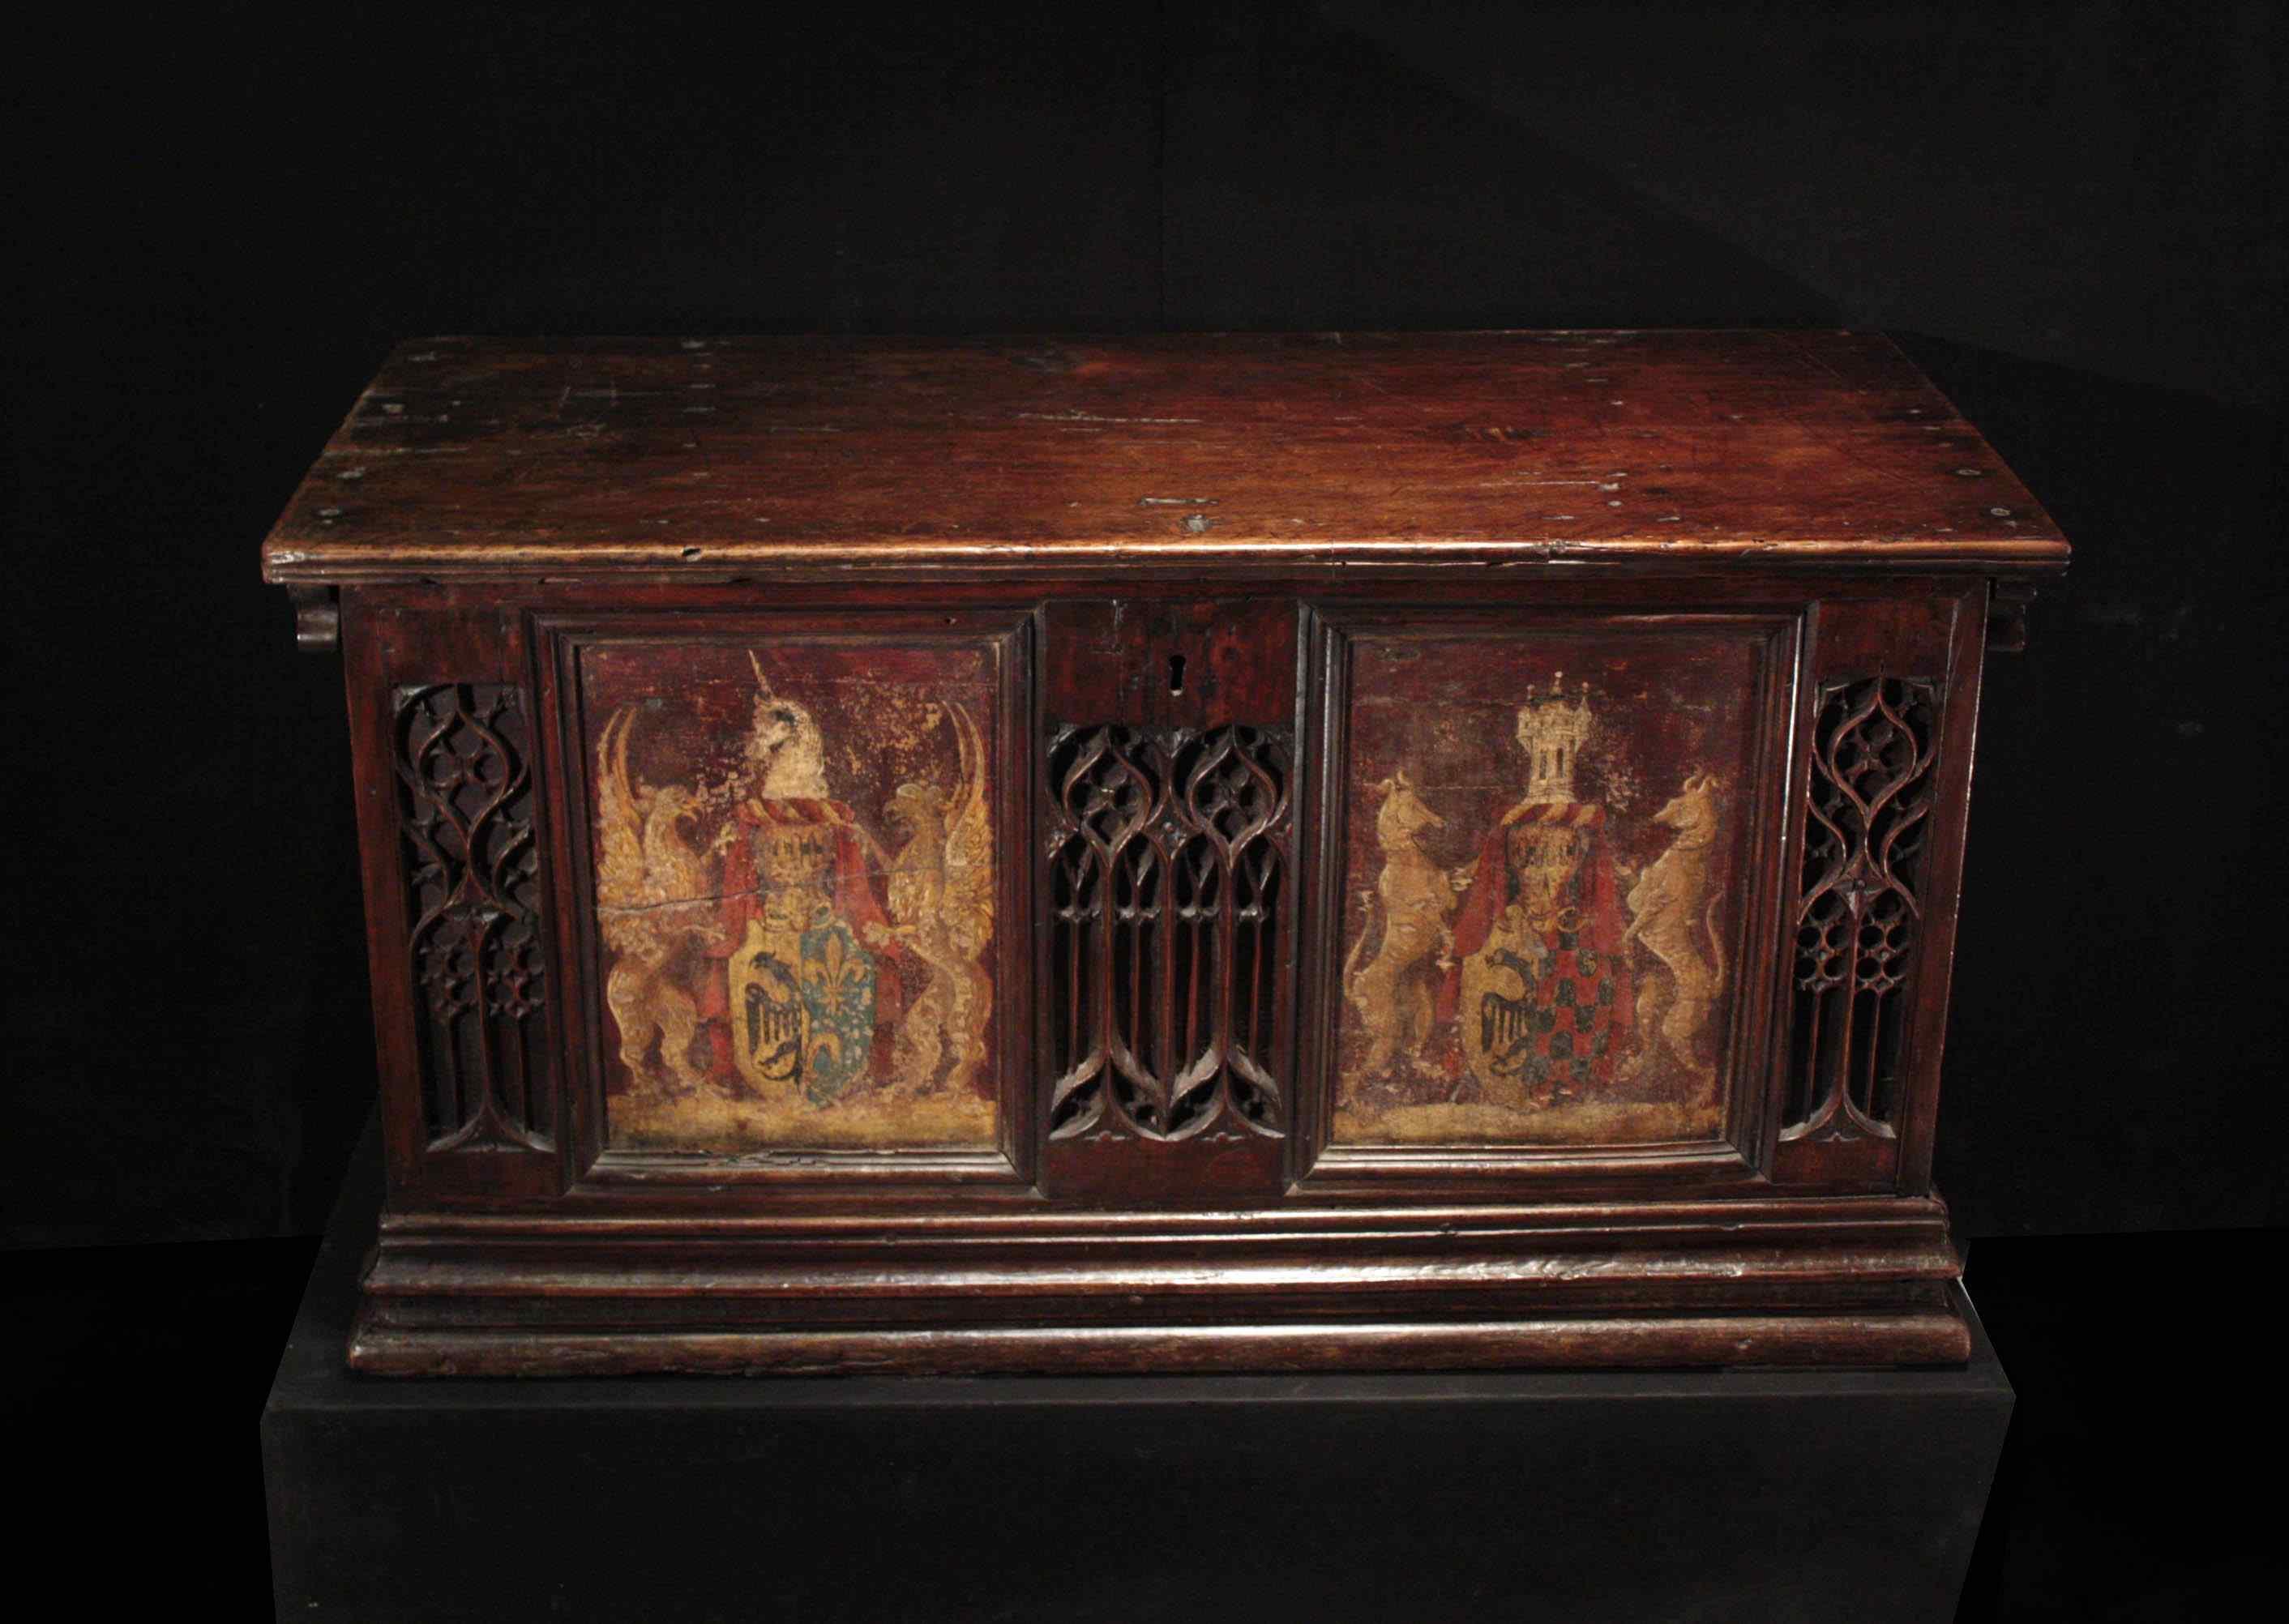 Gothic wedding case, France, early 15th century